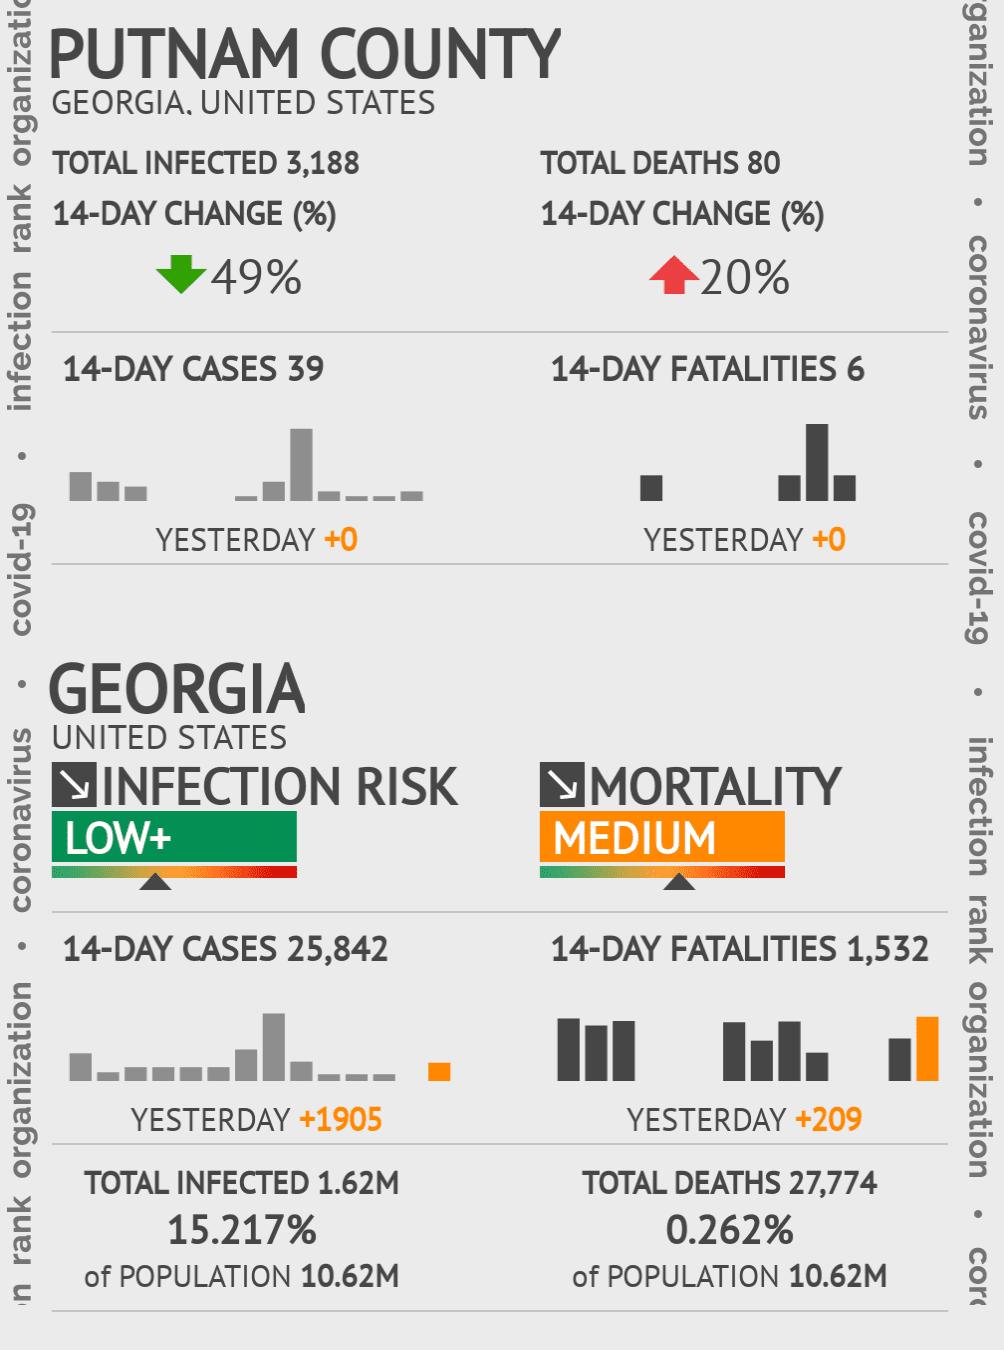 Putnam County Coronavirus Covid-19 Risk of Infection on November 29, 2020